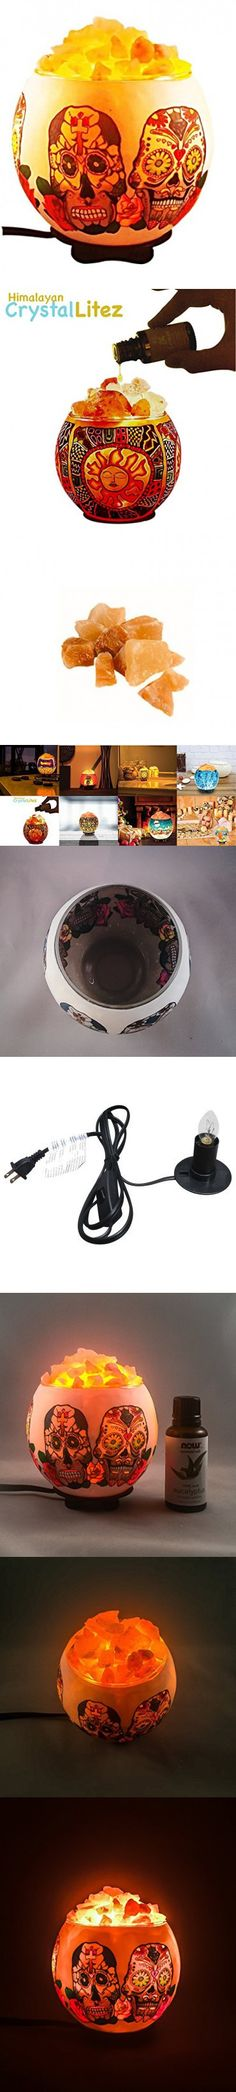 Himalayan CrystalLitez Natural Himalayan Salt Lamp in A Handcrafted and Unique Artisan Bowl,Natural Air Purifier and Aromatherapy Salt Lamp (Sugar Skull)